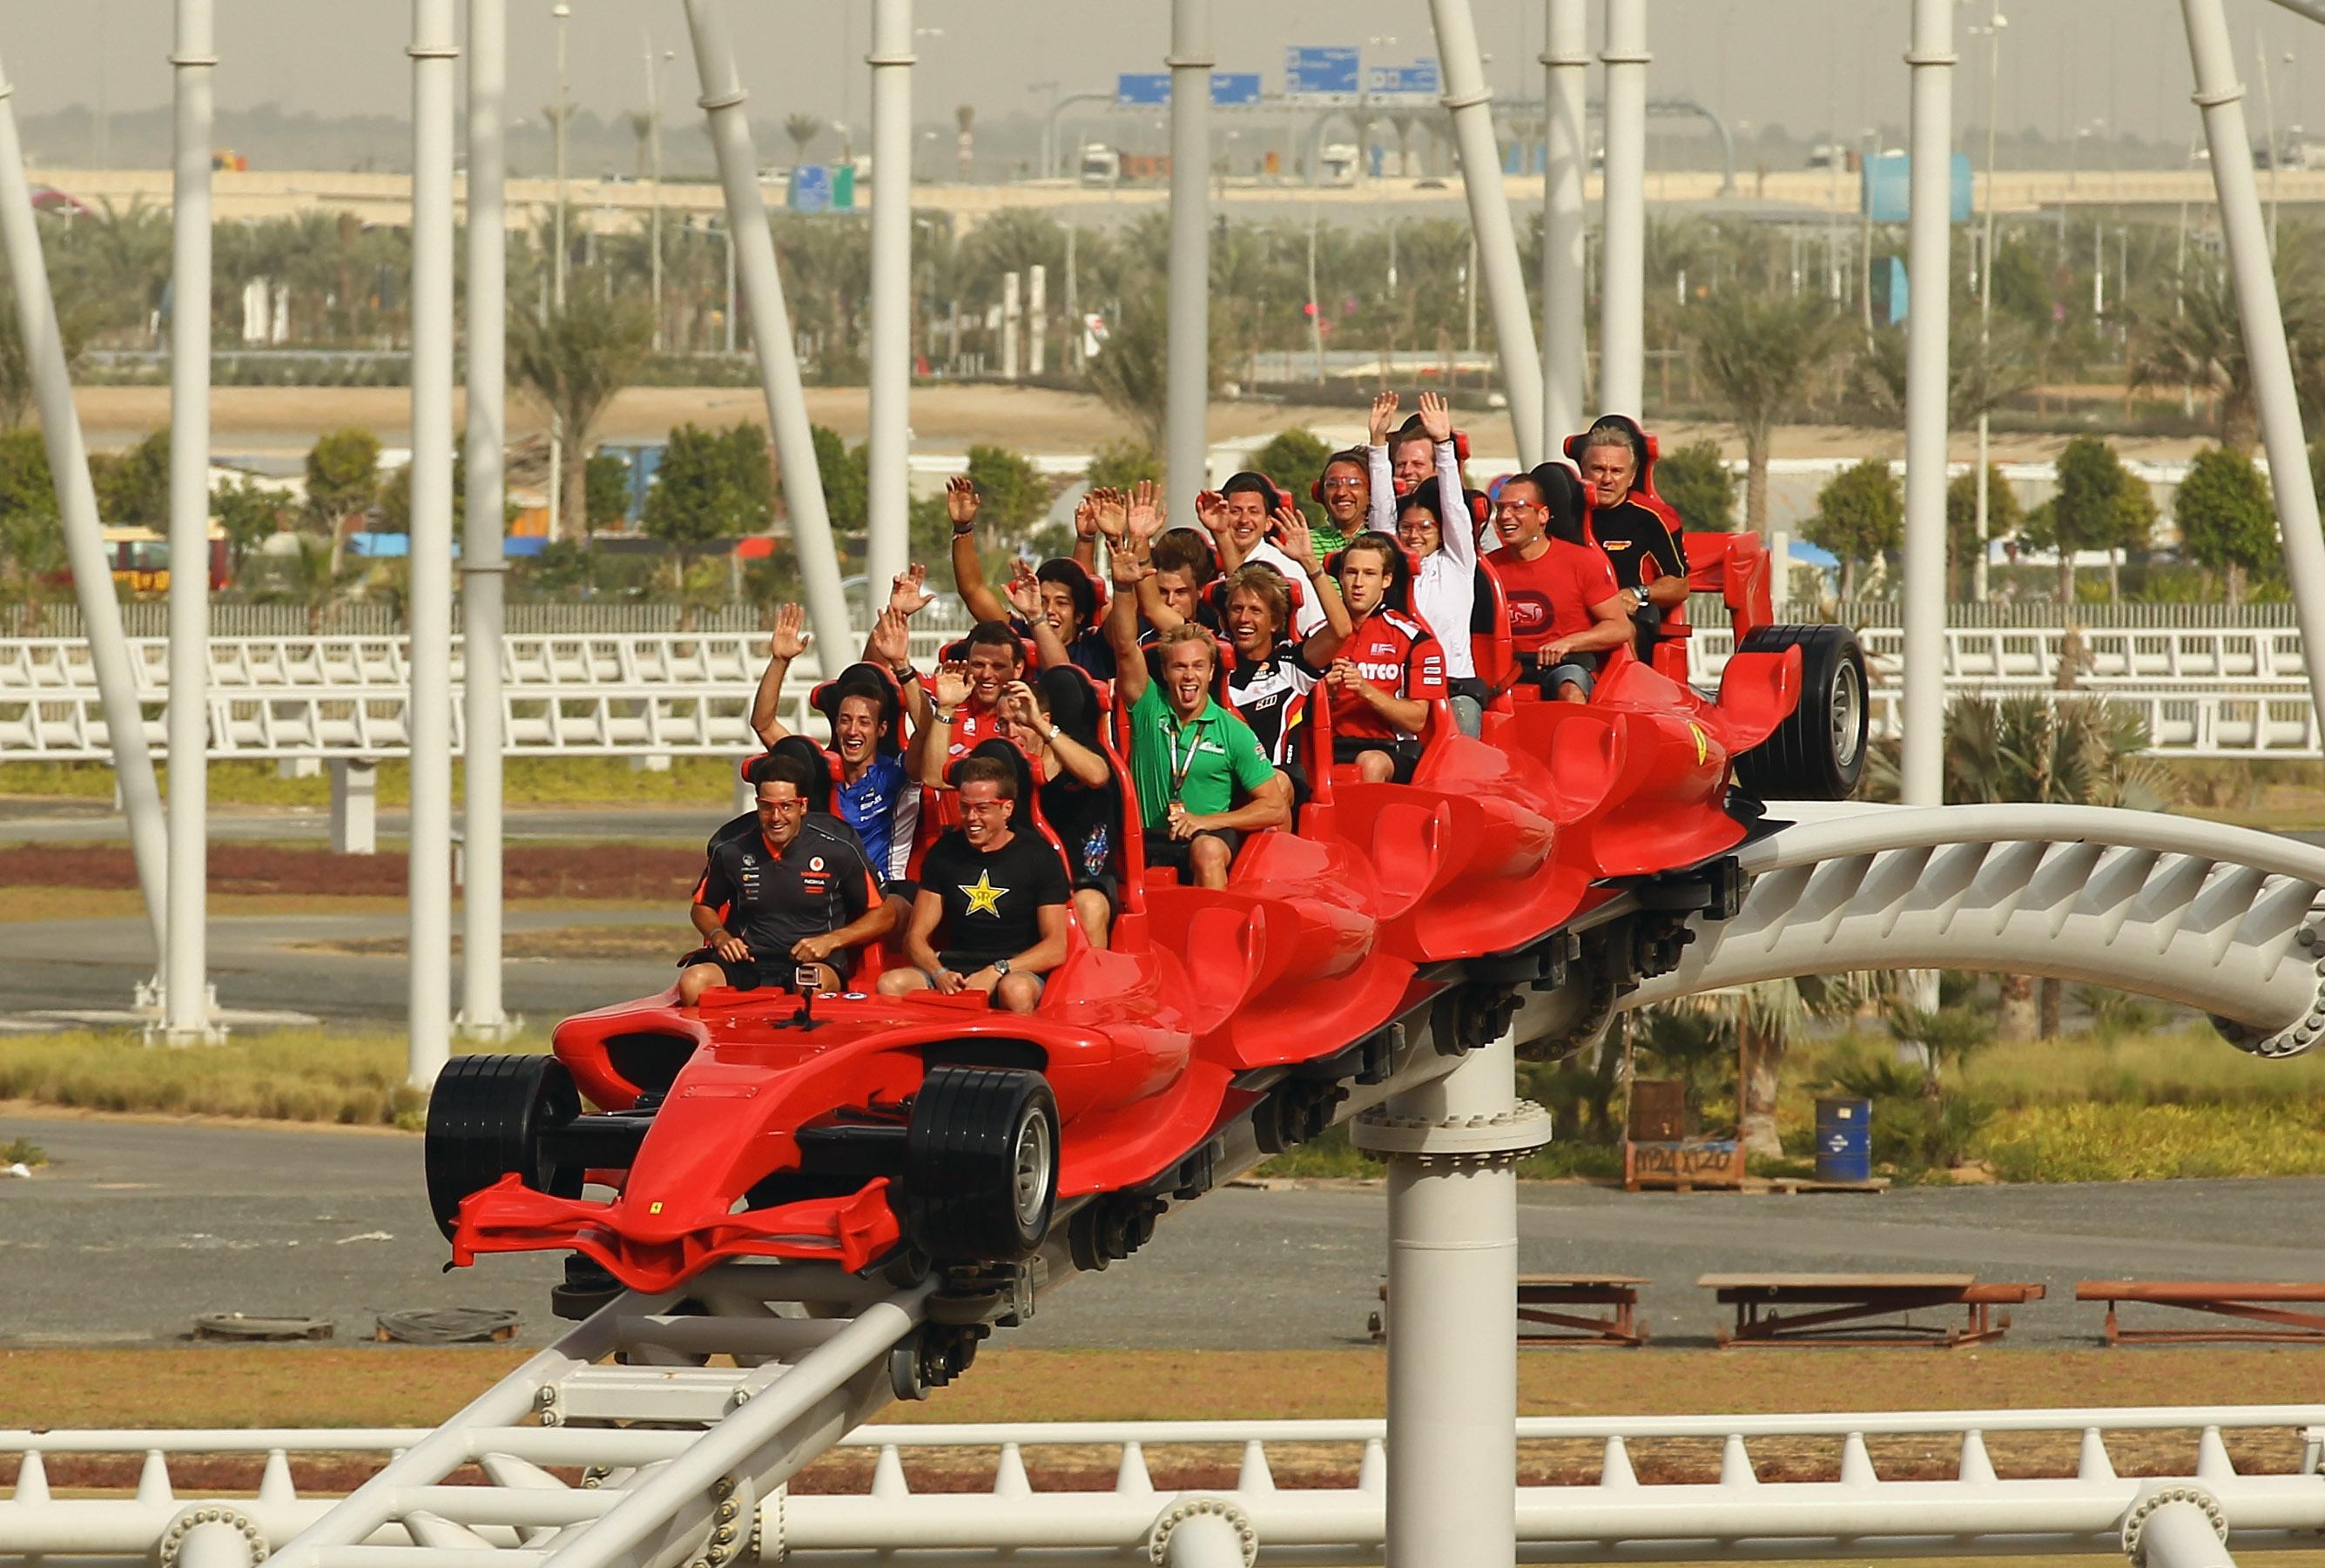 dubai new turbo dhabi world tracks theme opening night img park track ferrari abu rollercoaster